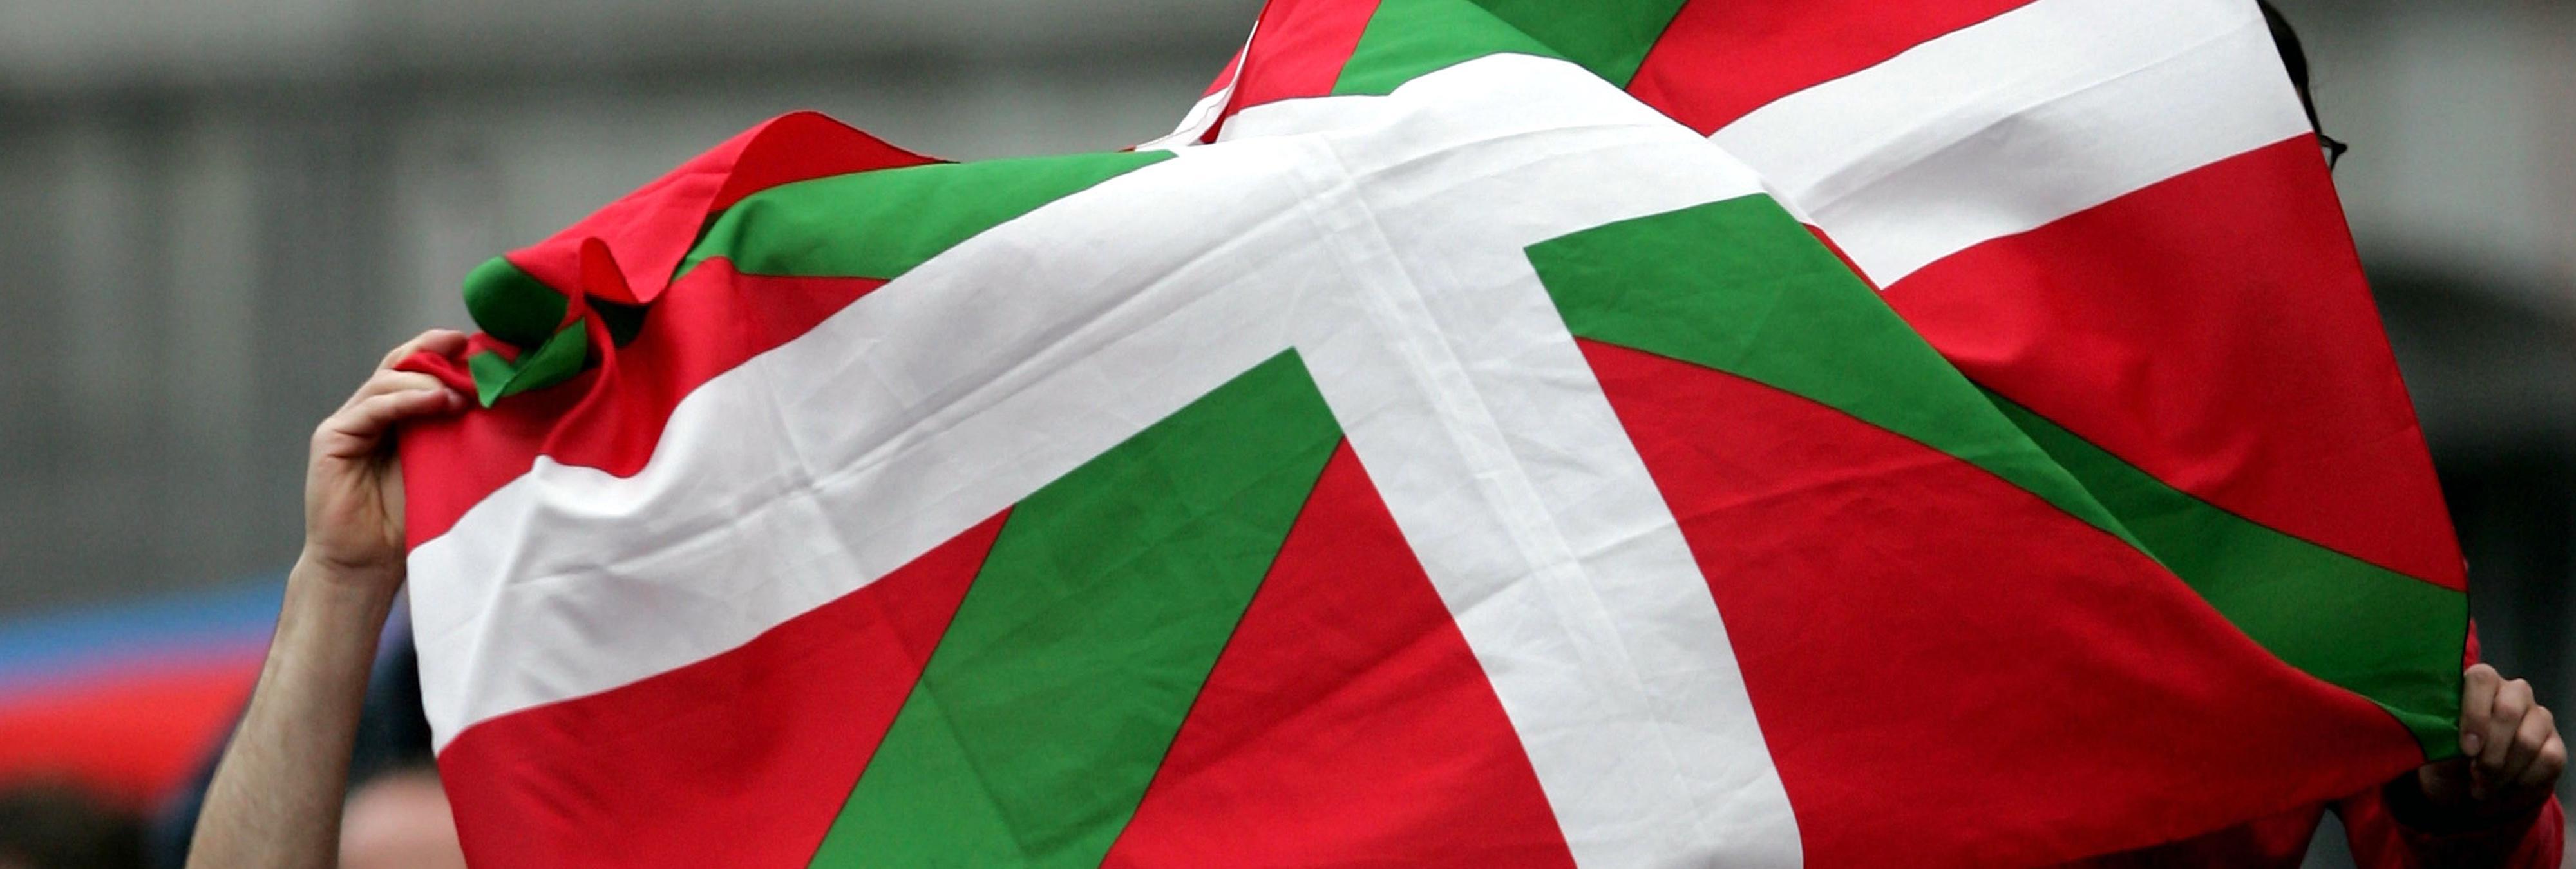 La bandera de Euskadi, prohibida en Eurovisión